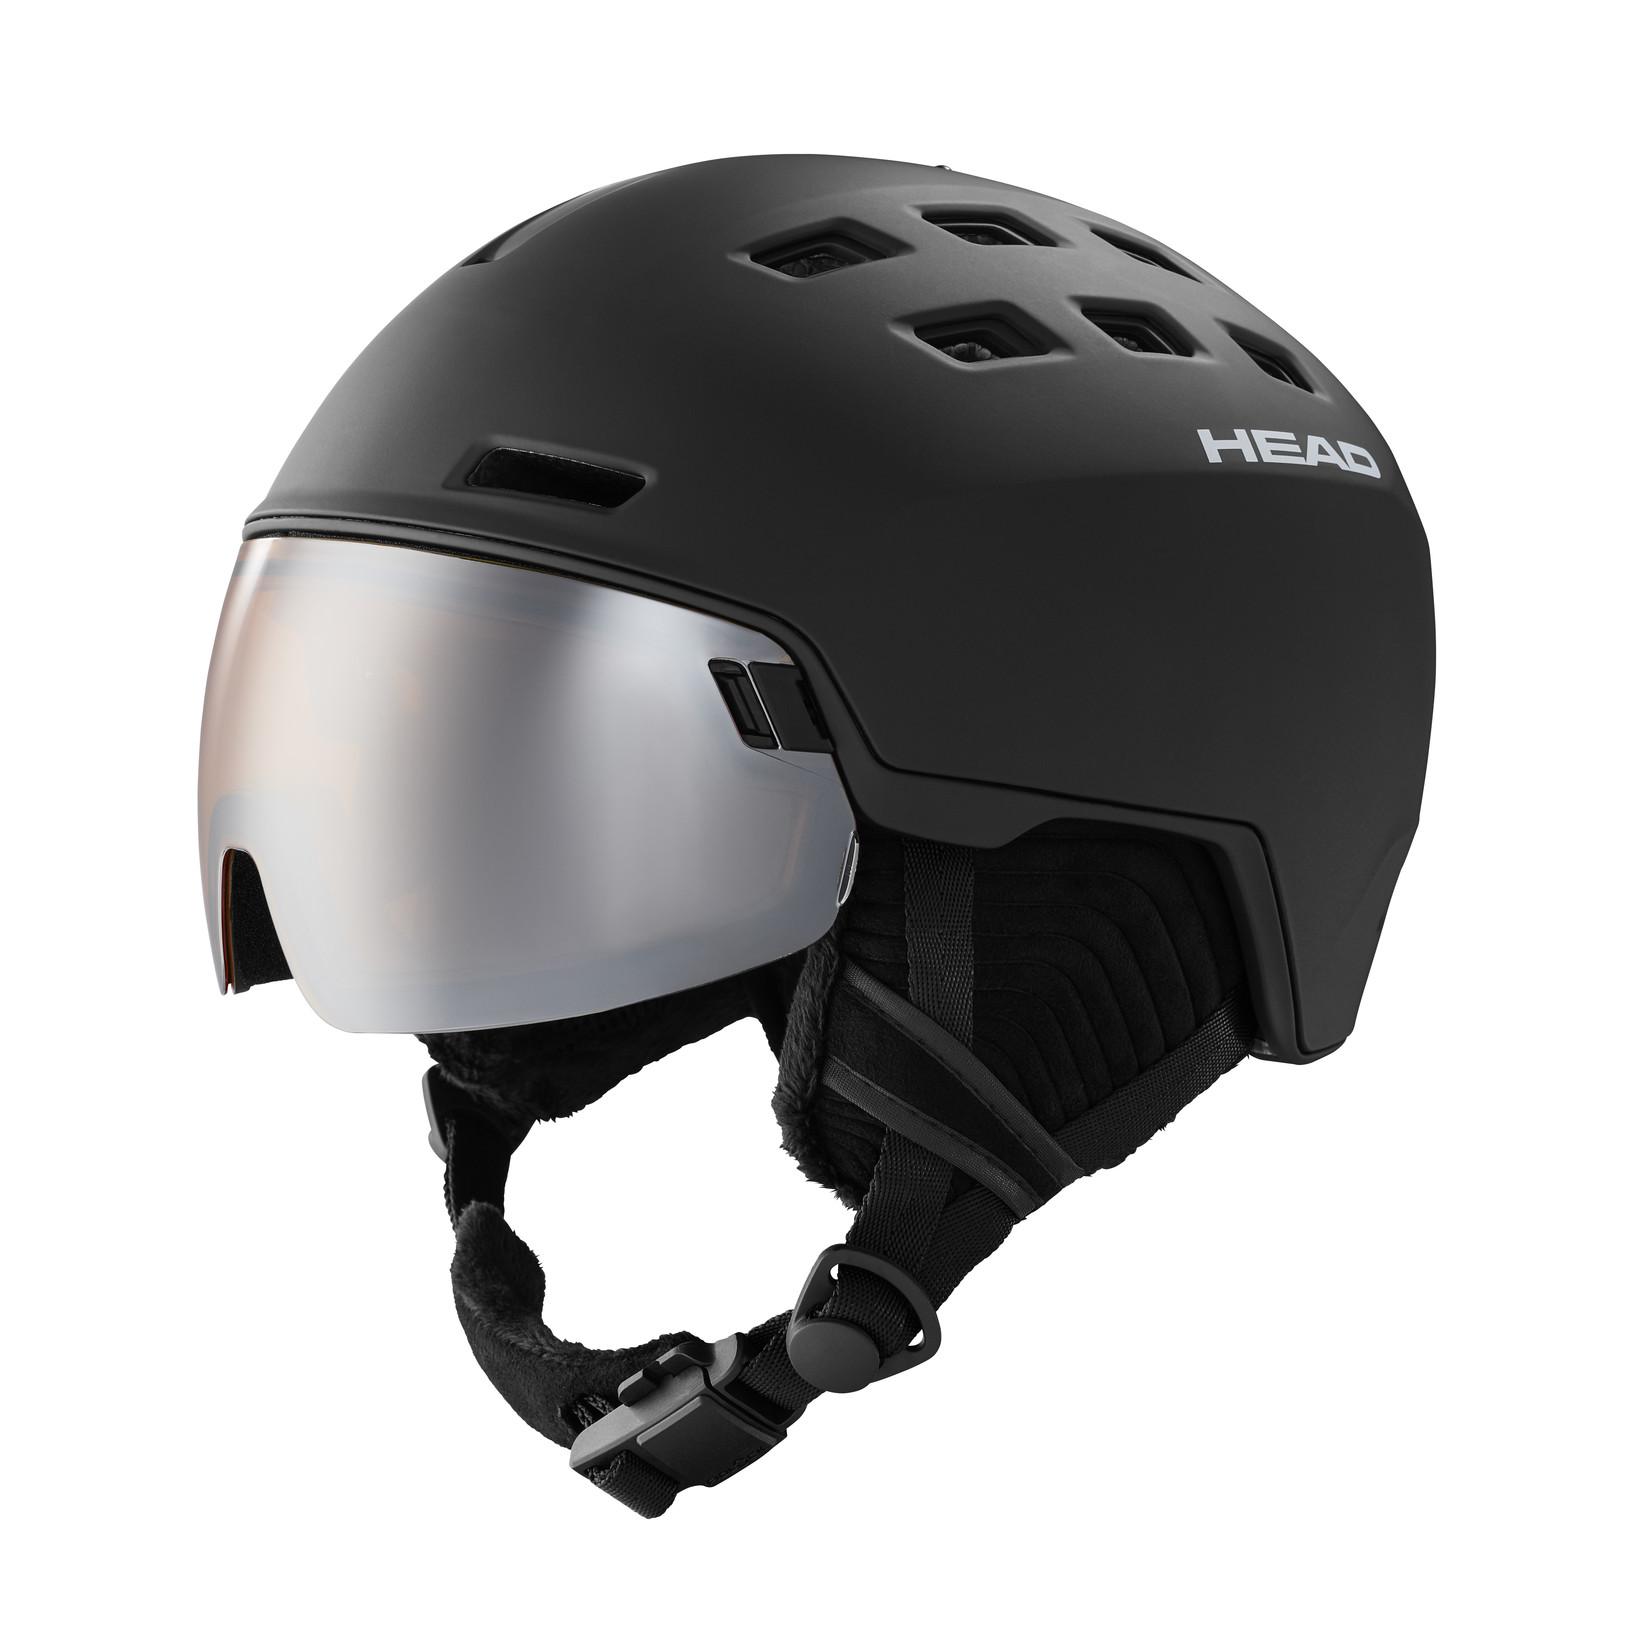 Head Head Men's Radar Snow Helmet